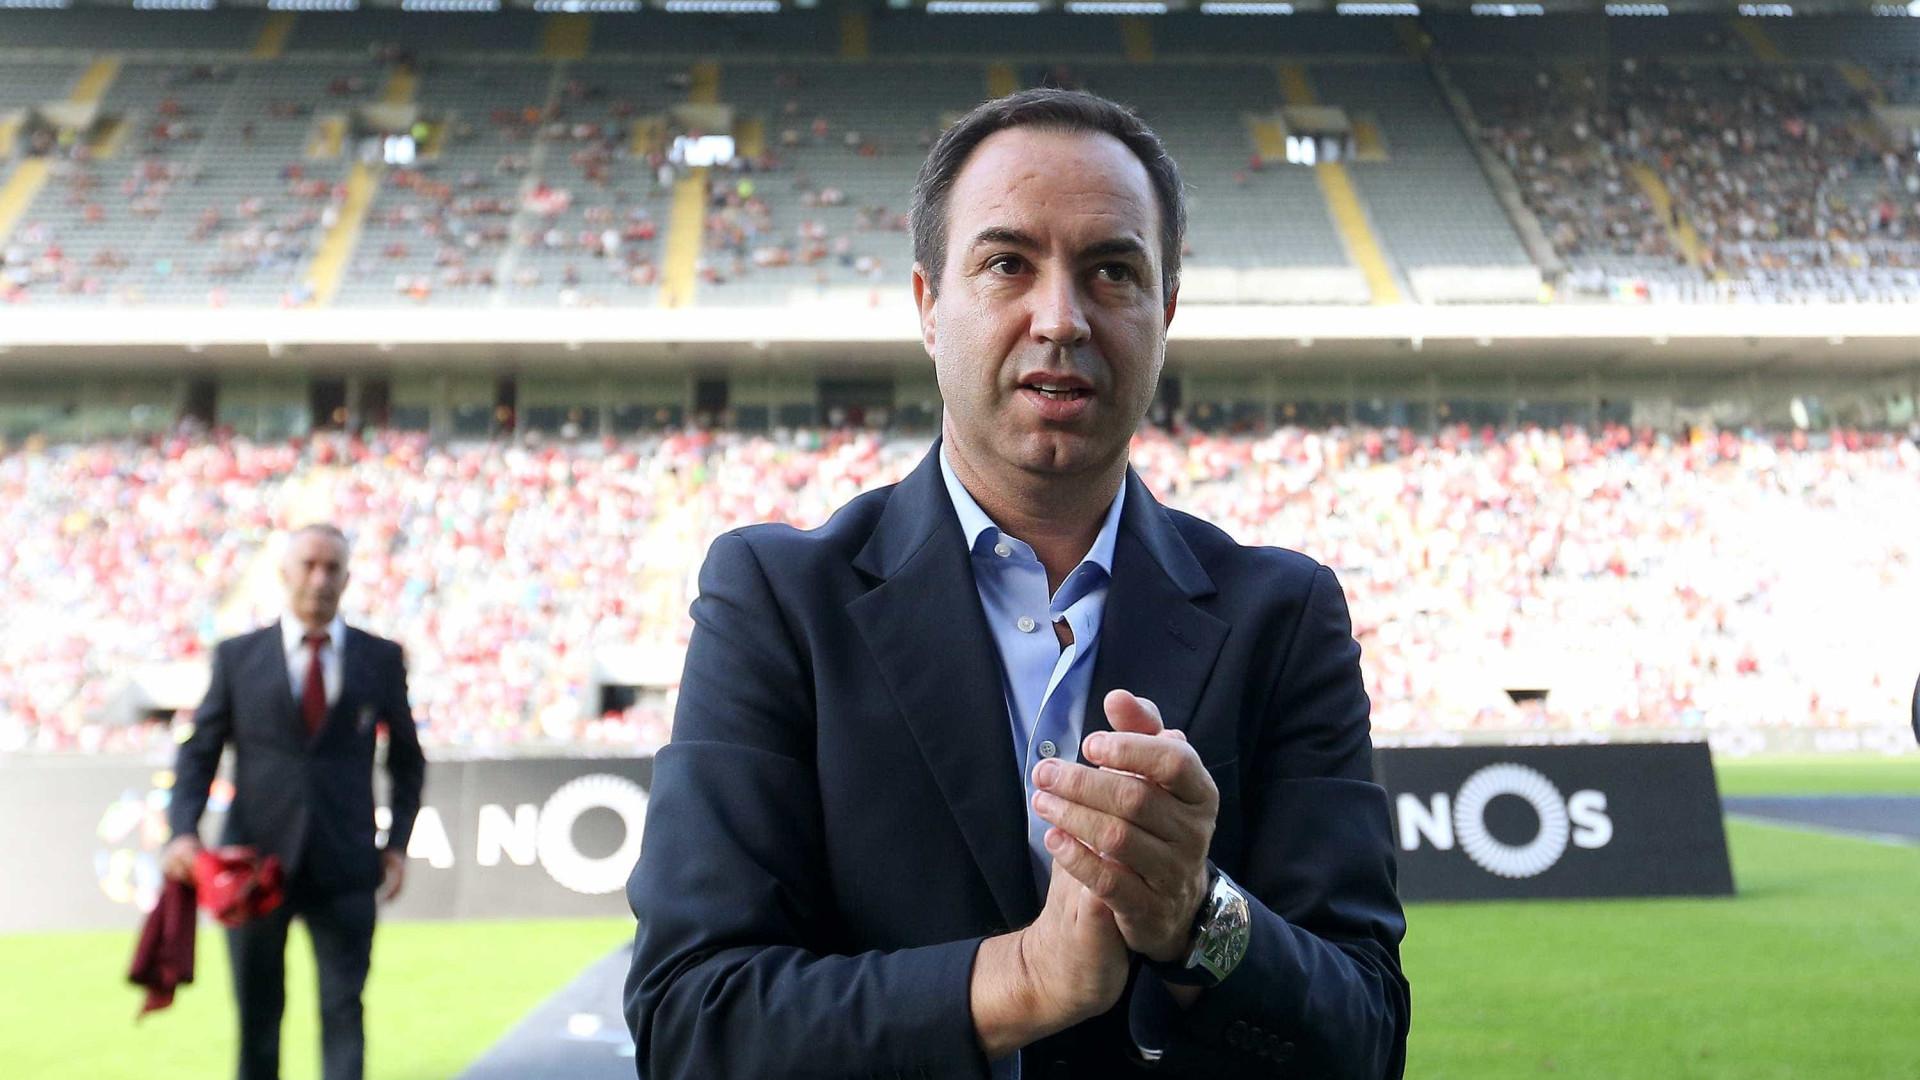 António Salvador denunciou por carta favores dos árbitros ao Sporting